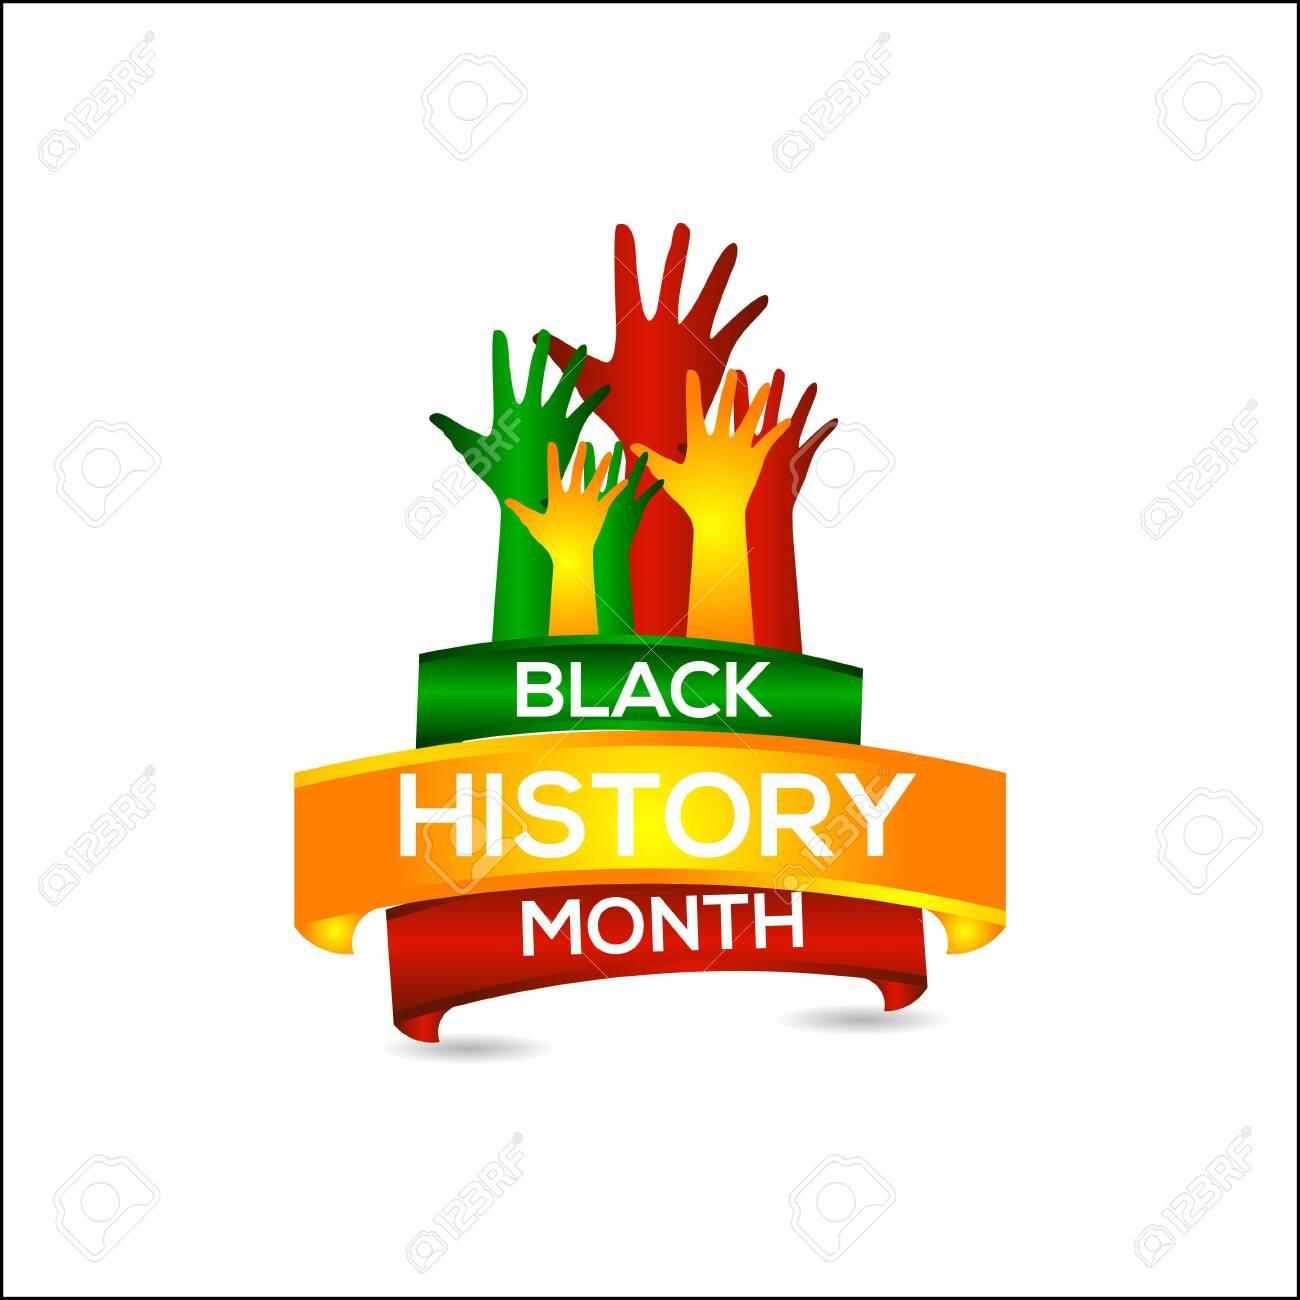 Black History Month Vector Template Design Illustration - 124358961